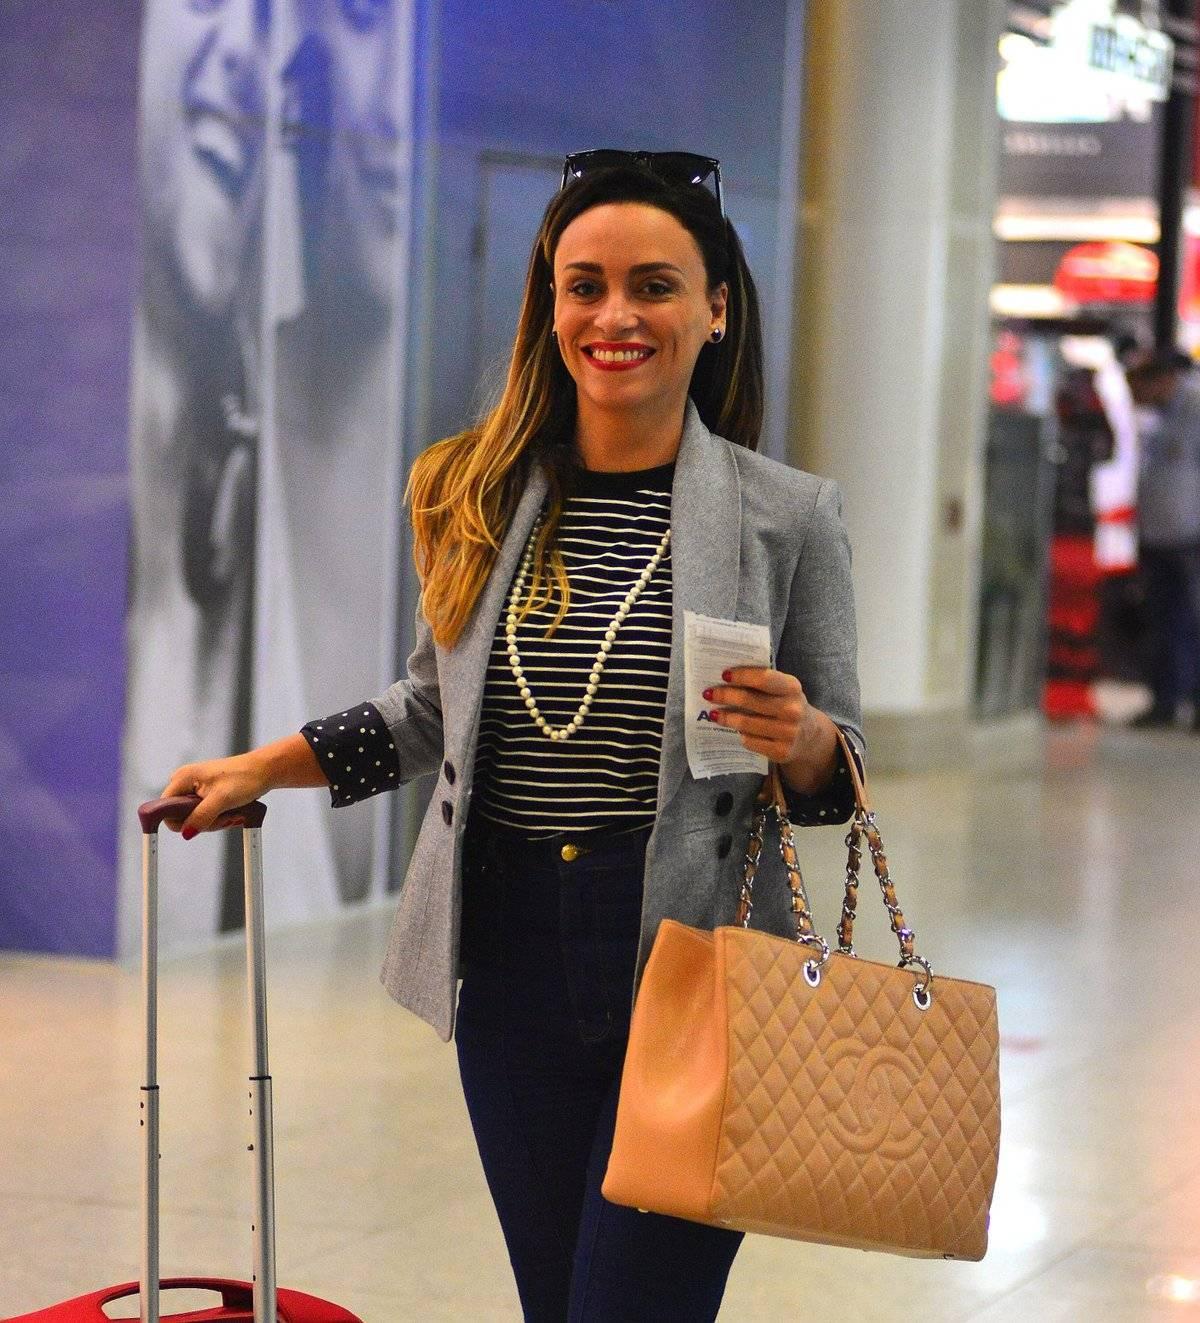 25668bcd29 ... Suzana Pires desfilou pelo aeroporto Santos Dummont